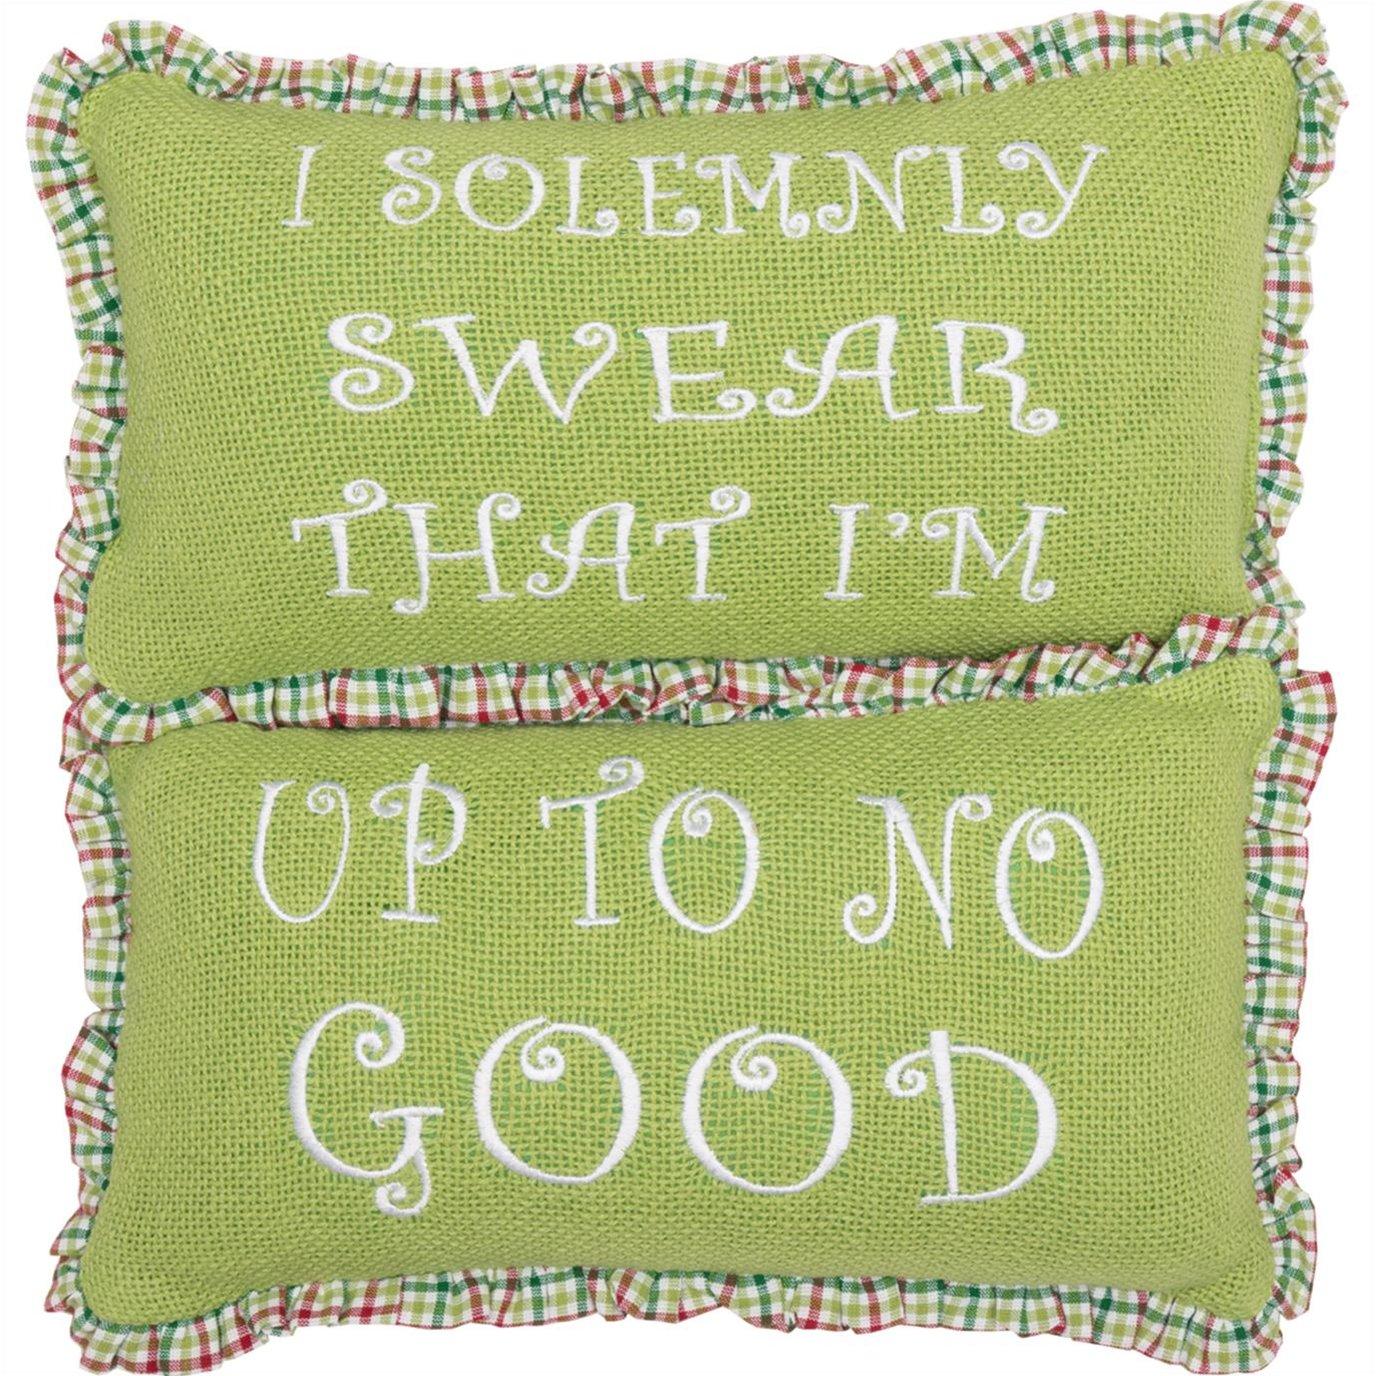 Whimsical Christmas Pillows Up To No Good Set of 2 7x13